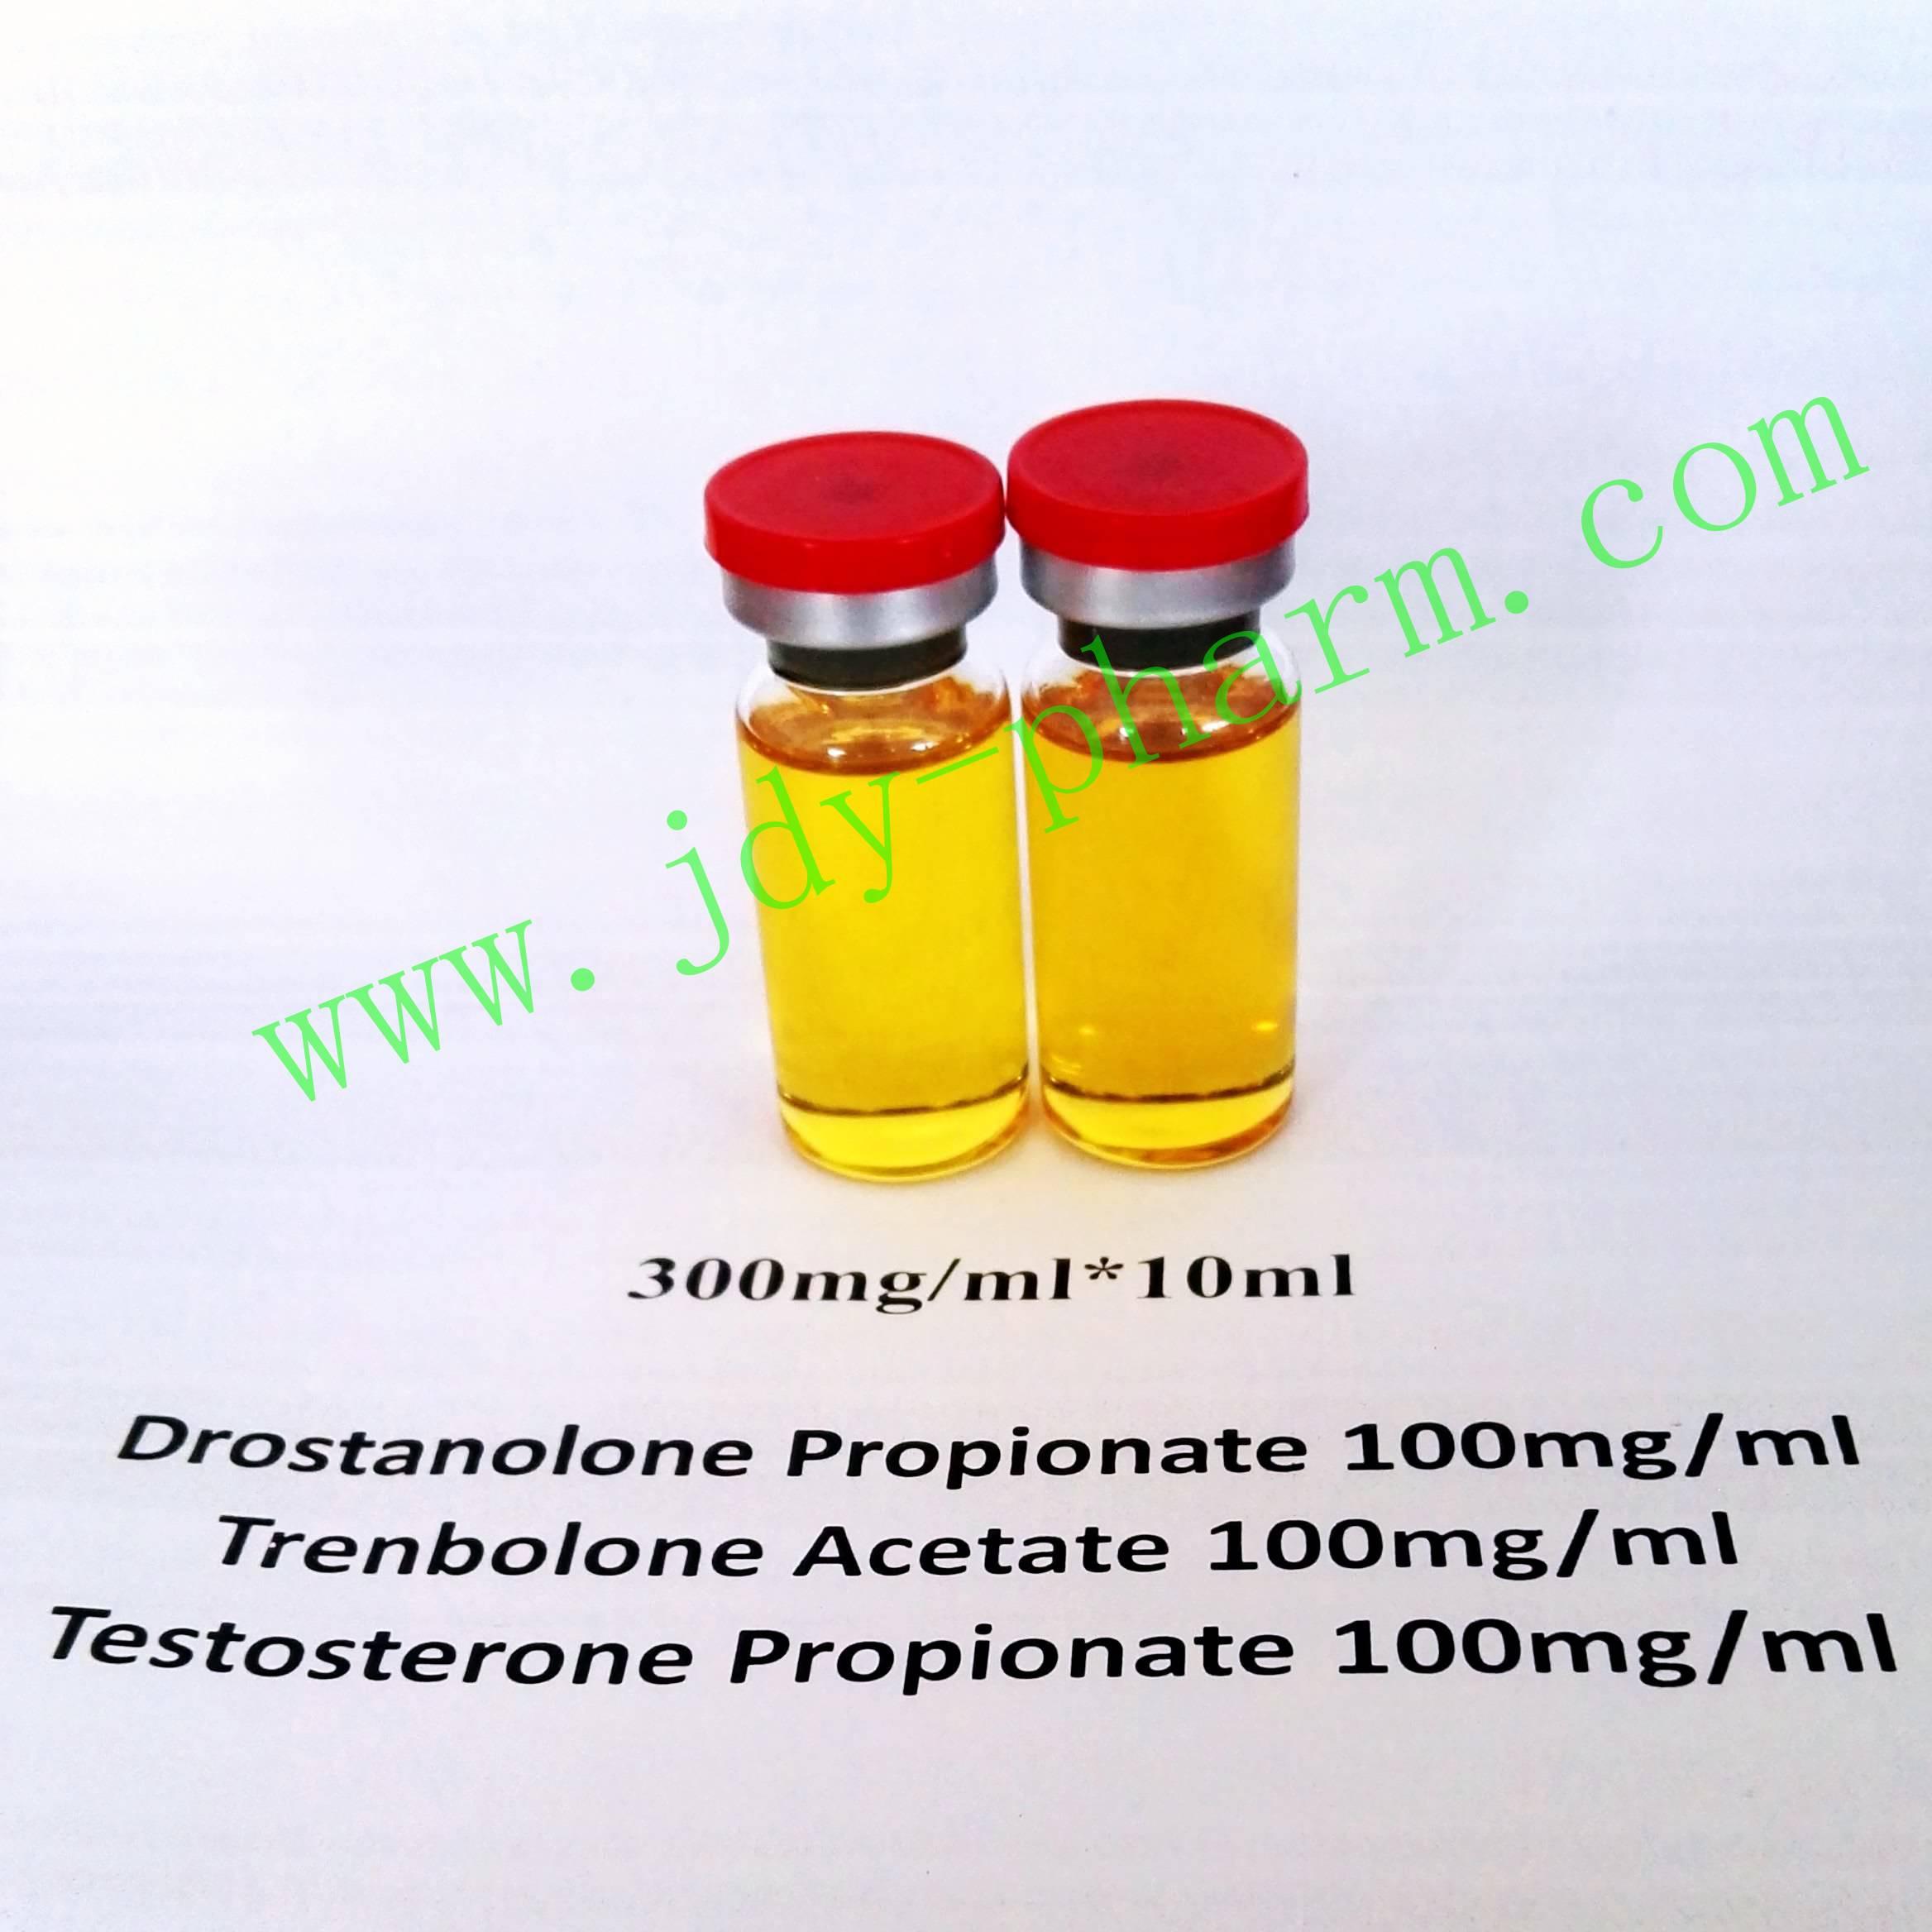 Drostanolone Propionate,Trenbolone Acetate ,Testosterone Propionate